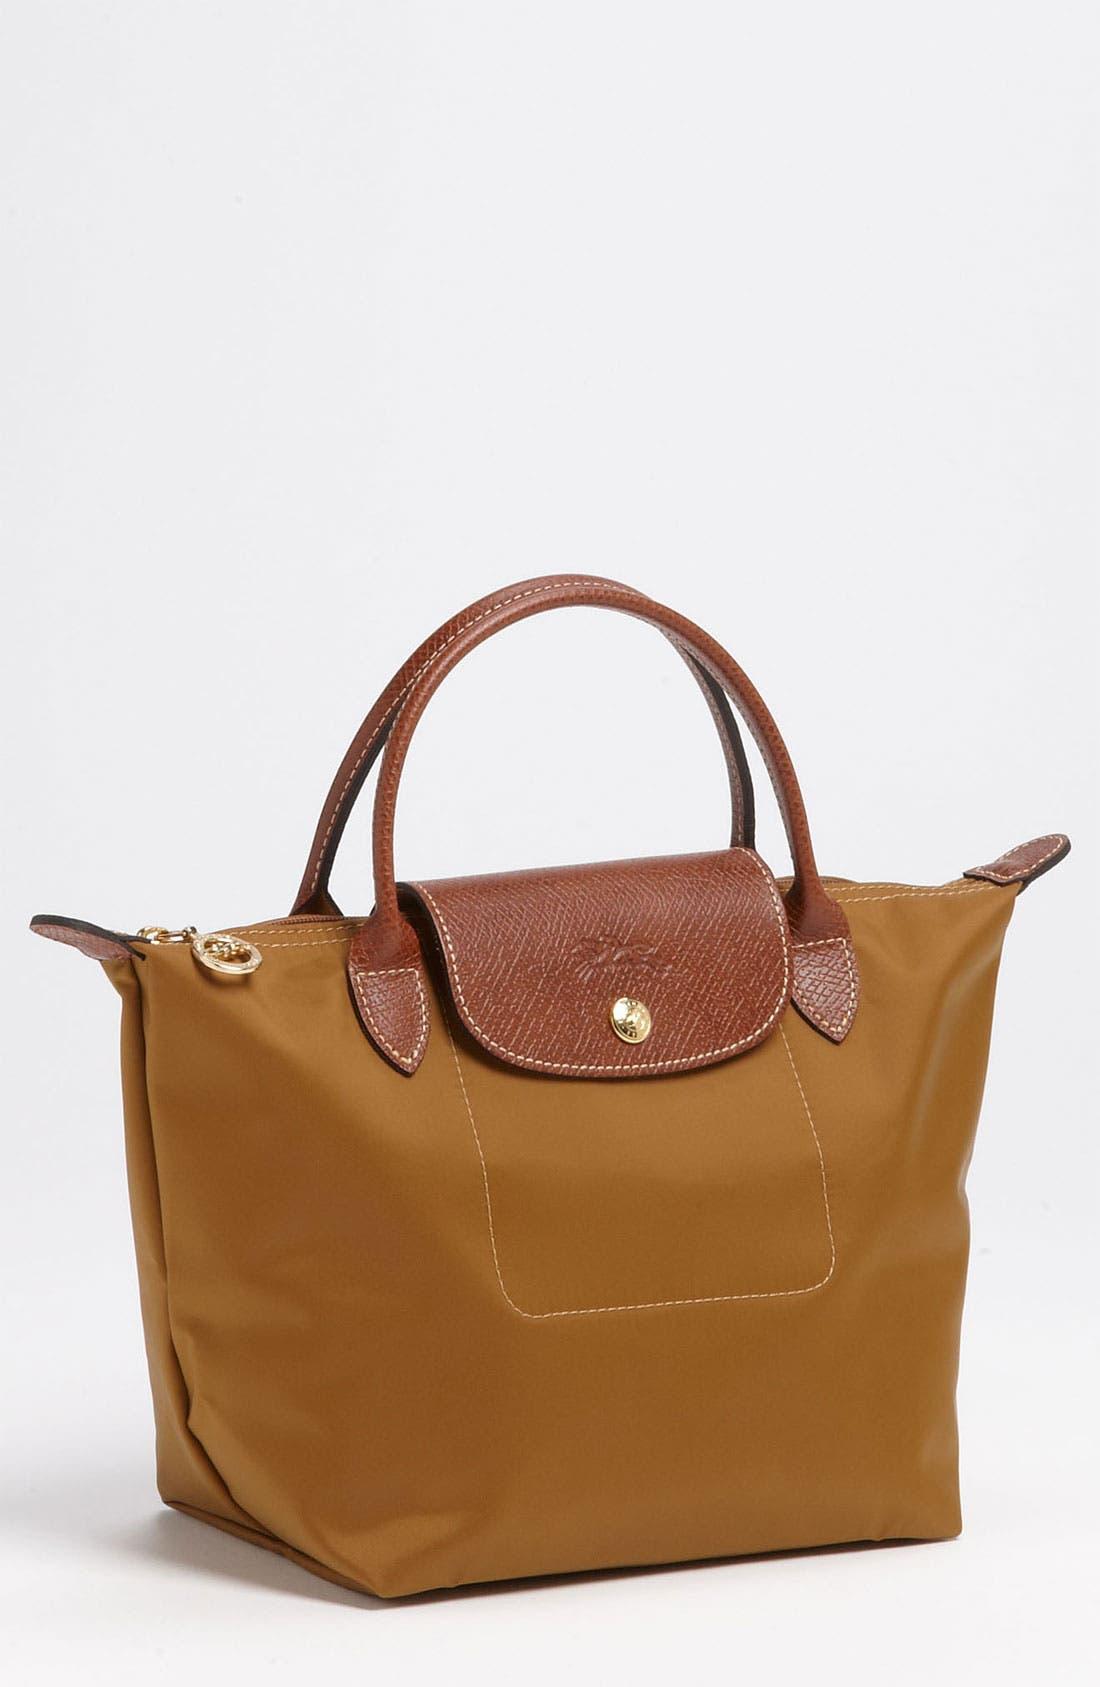 Main Image - Longchamp 'Le Pliage - Small' Tote